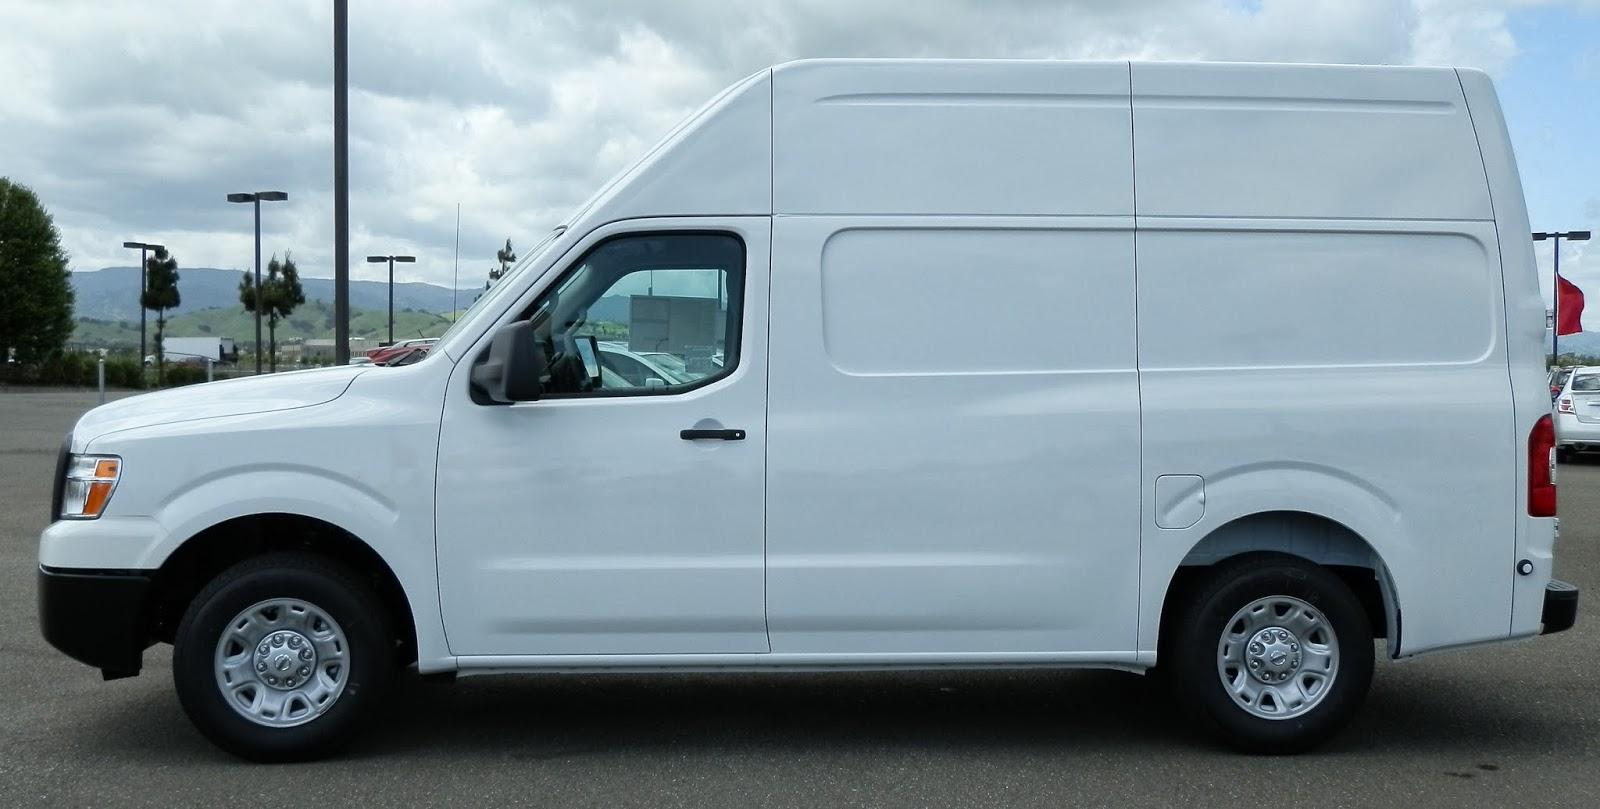 Vacaville Nissan Fleet Vacaville Nissan Nv Cargo Van Of